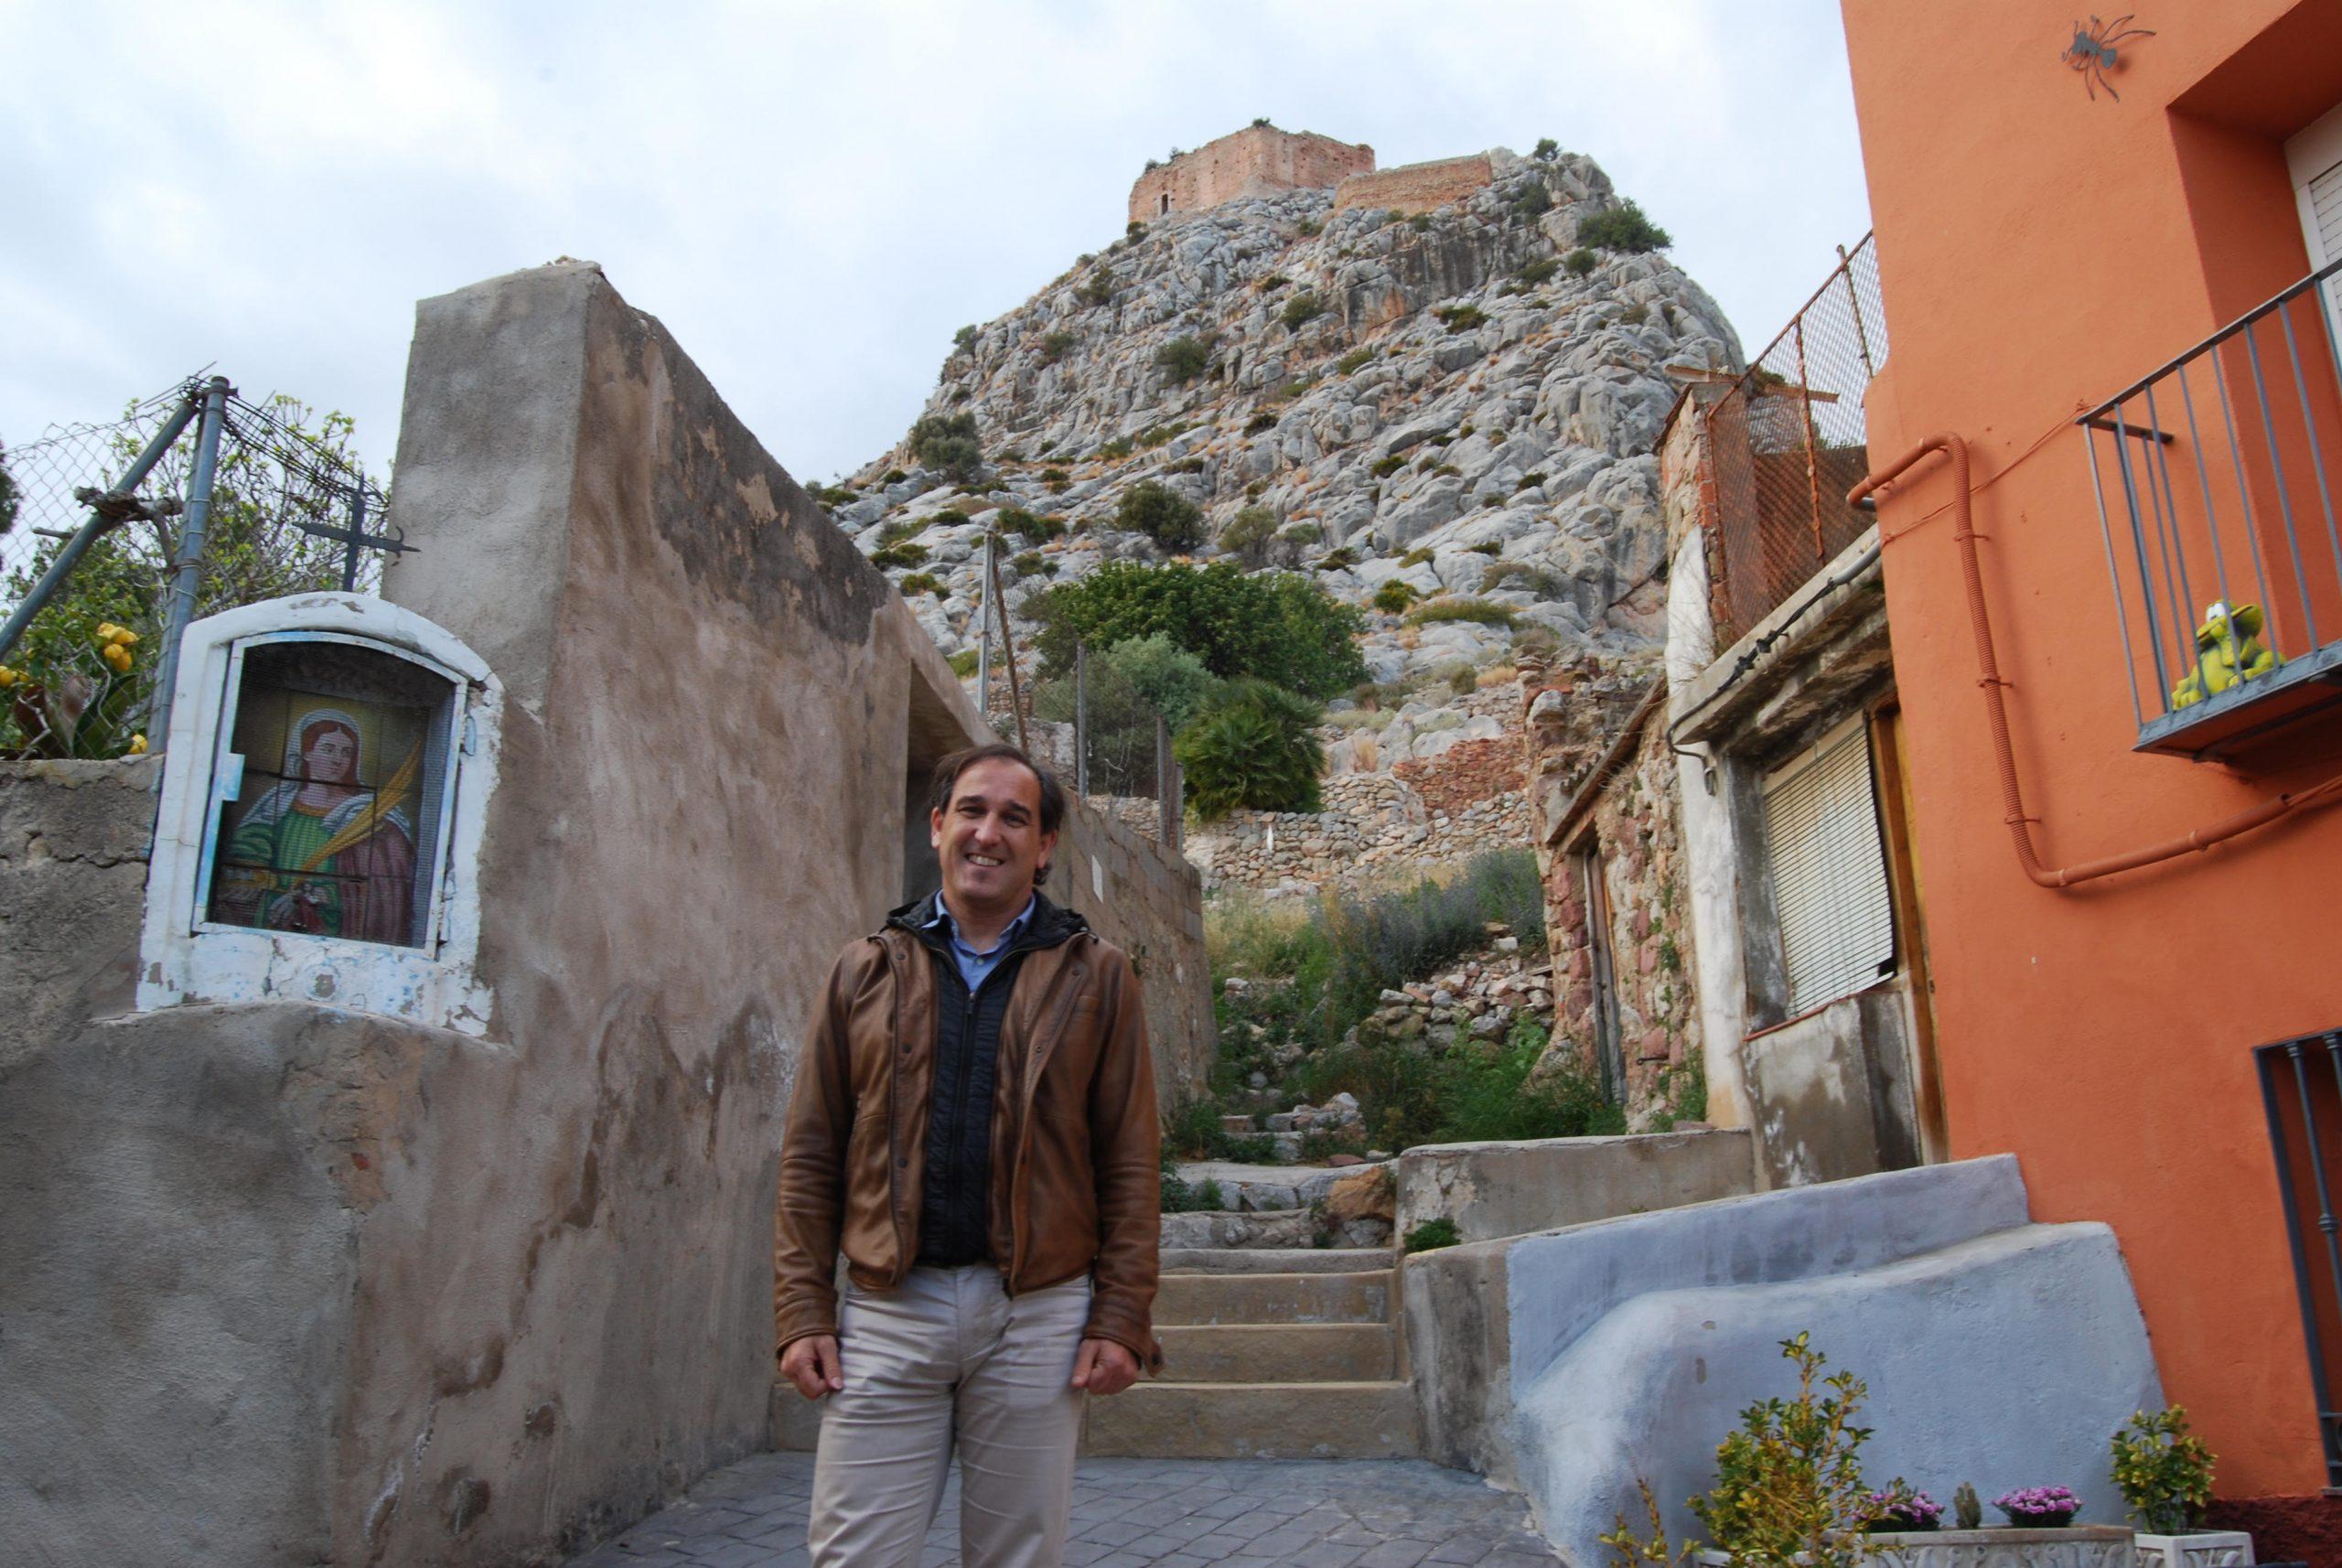 Entrevista al portavoz del PSPV de Borriol, Toni Gálvez